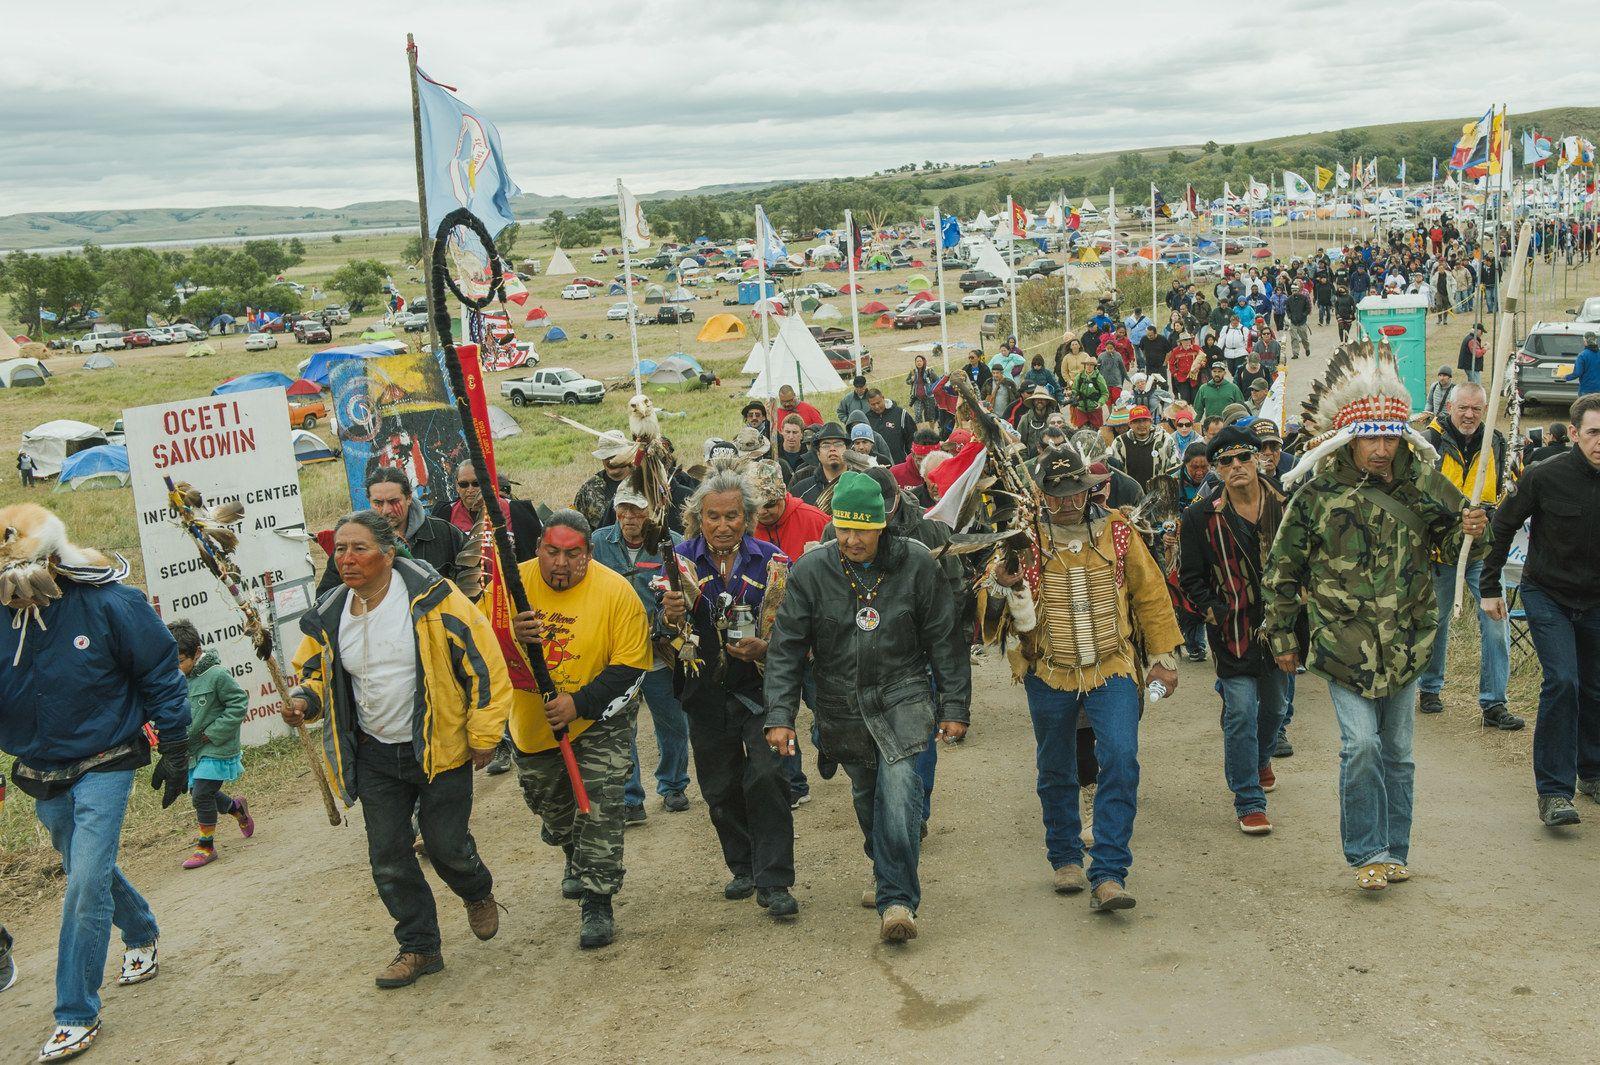 Here S What It S Like At The Standing Rock Pipeline Protest In North Dakota Dakota Pipeline Protest Standing Rock Protest Dakota Pipeline